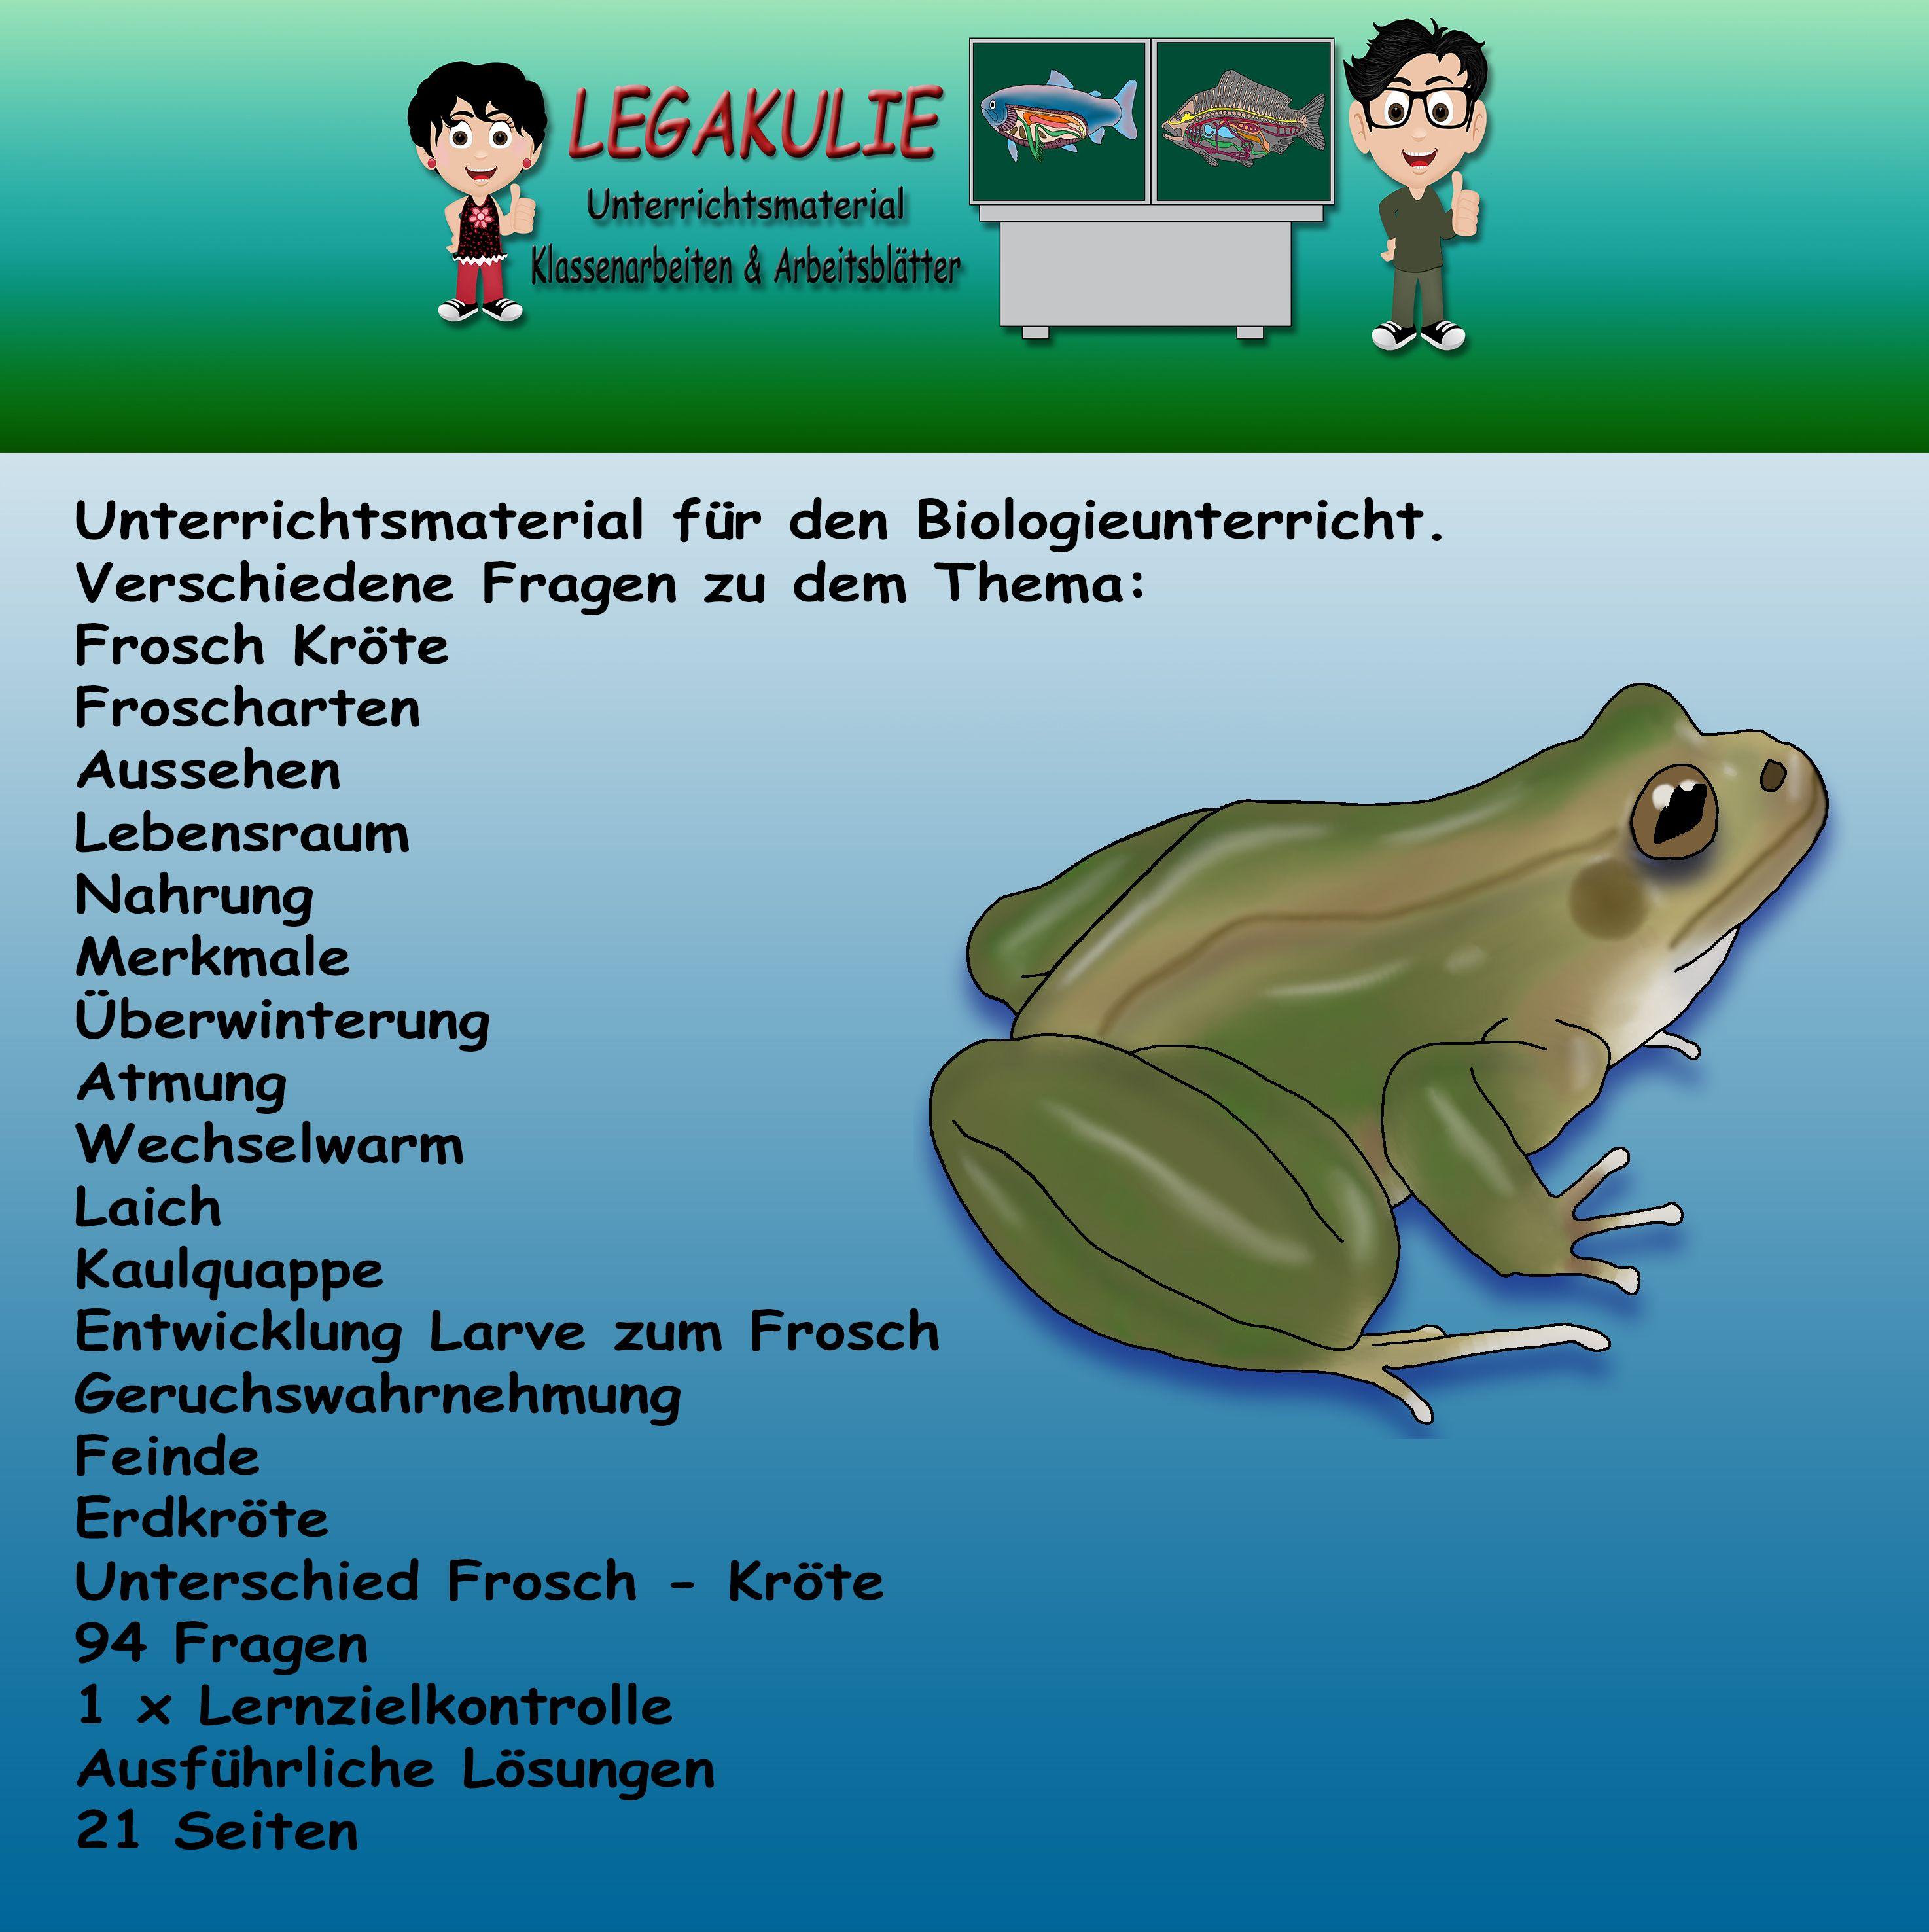 Verschiedene Fragen Zu Dem Thema Frosch Krote Froscharten Aussehen Lebensraum Nahrung Merkmale Uberwinterung Atmung Wechselwar Klassenarbeiten Frosch Biologie